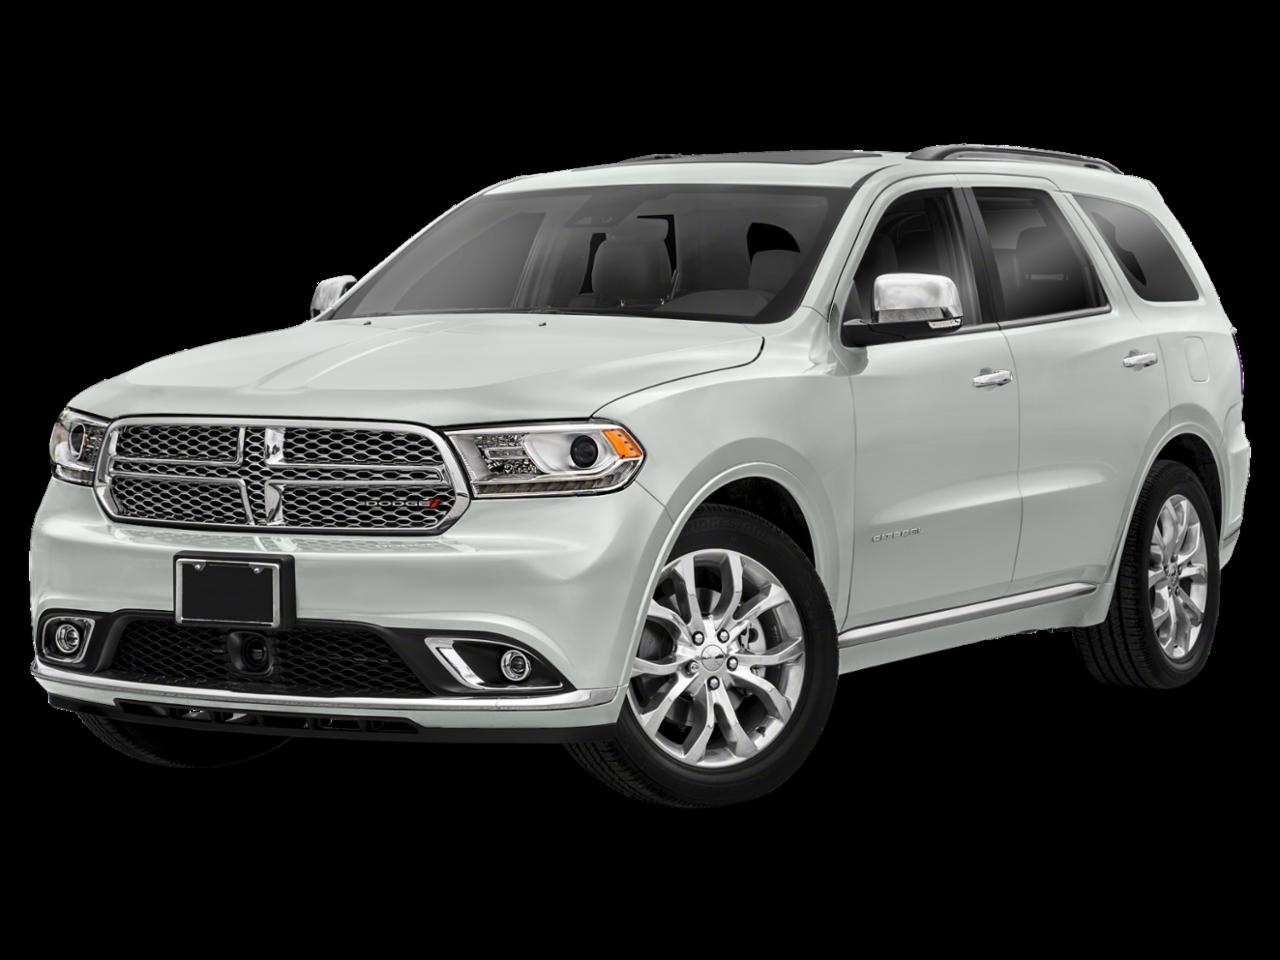 2018 Dodge Durango Sport Utility